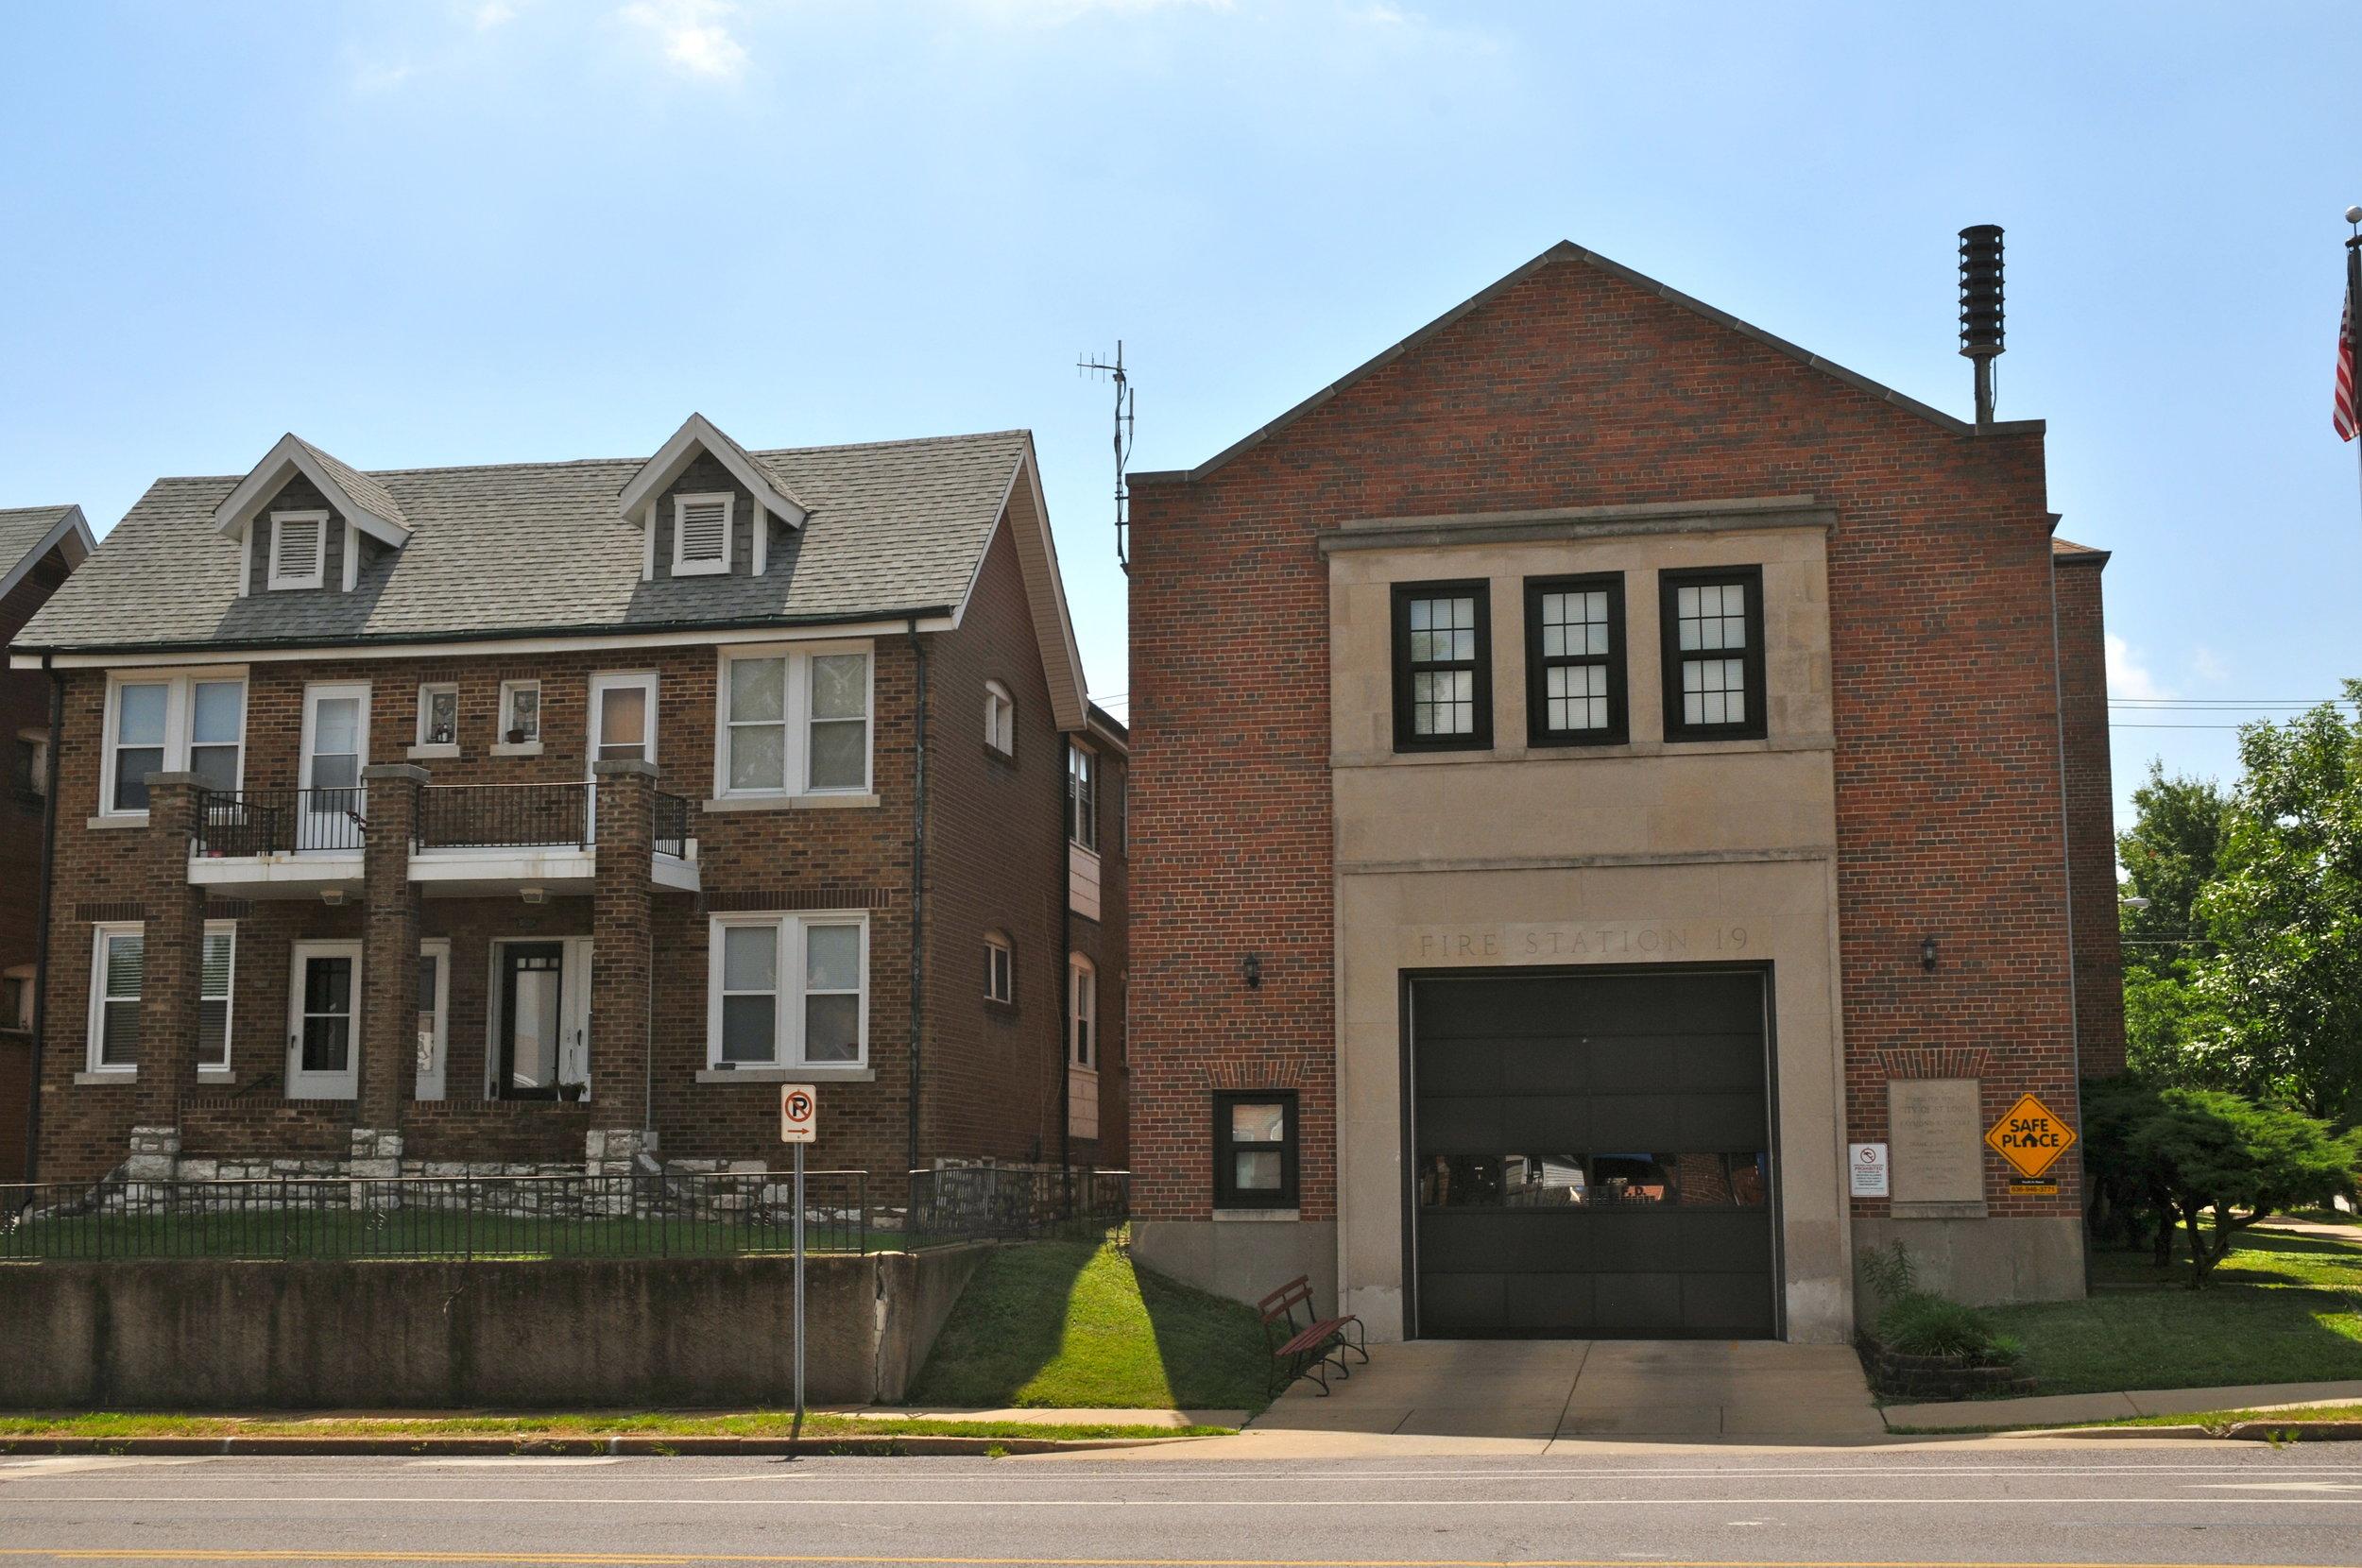 Firehouse #19 - Boulevard Heights